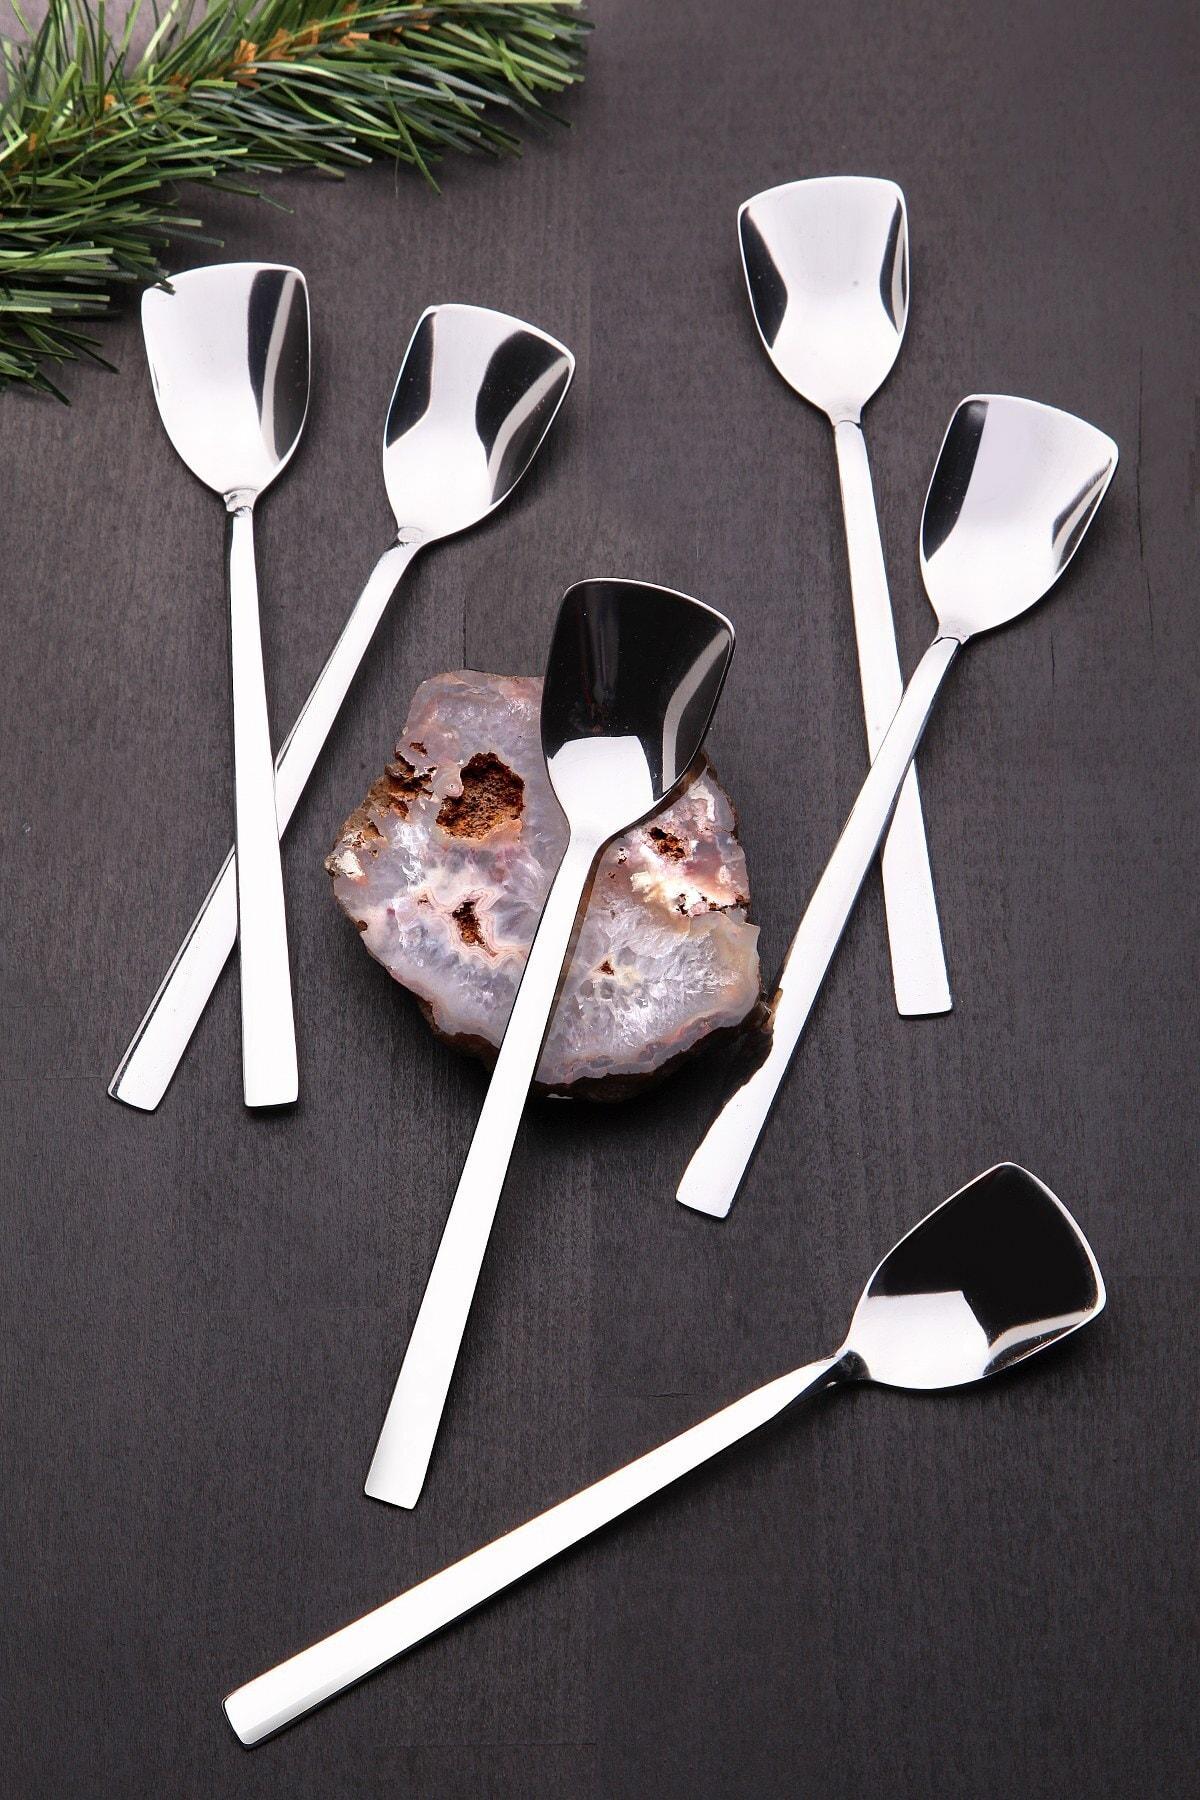 Kitchen Life Paslanmaz Çelik 6'lı Lüx Dondurma Kaşığı 1